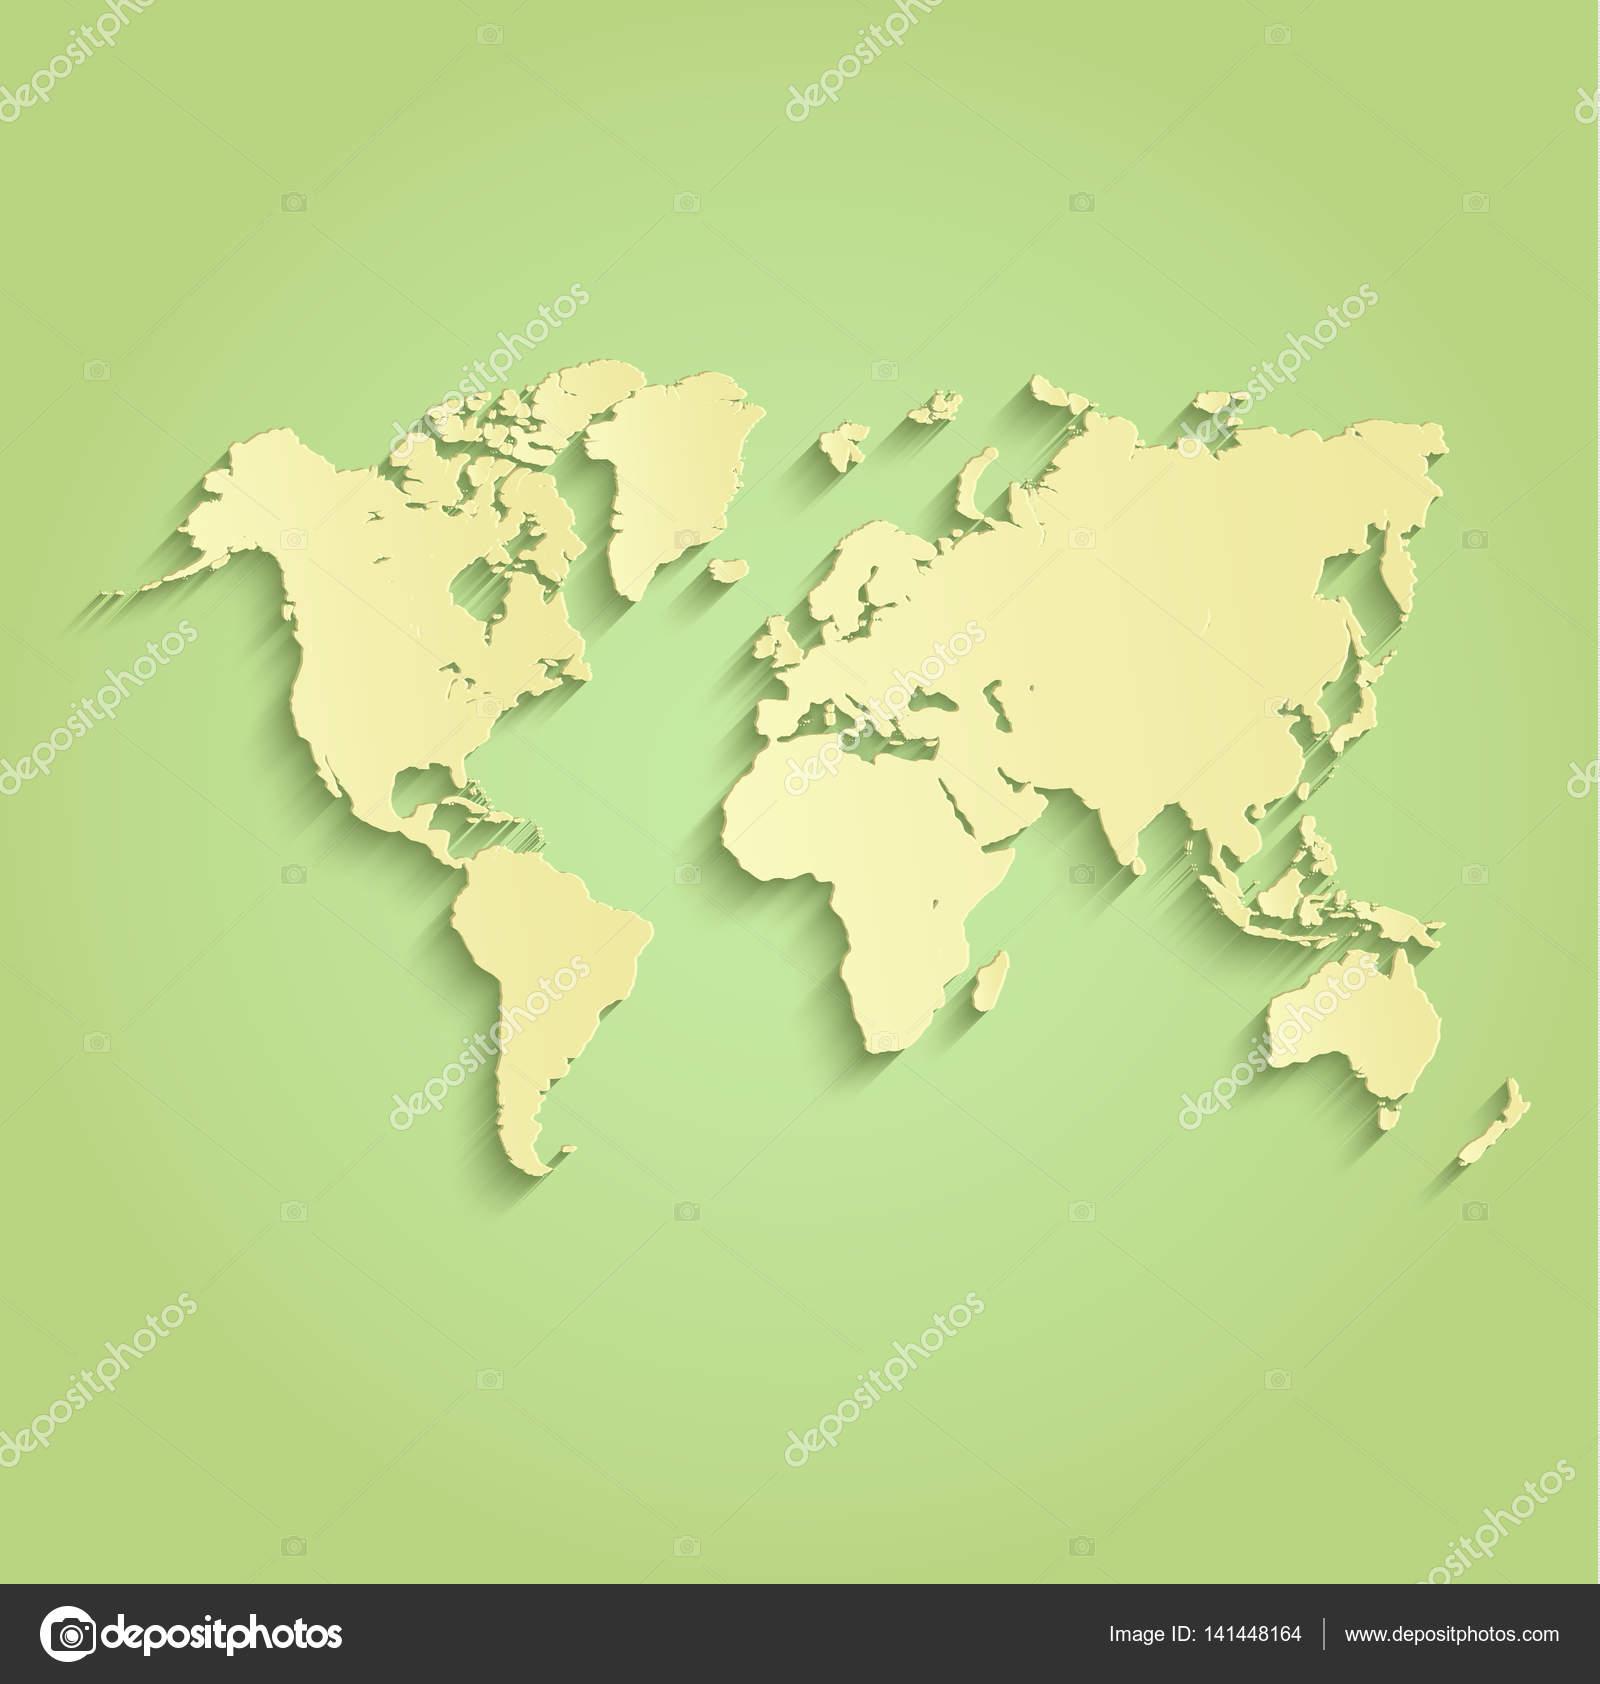 World map green yellow raster stock photo mondih 141448164 world map green yellow raster stock photo gumiabroncs Gallery